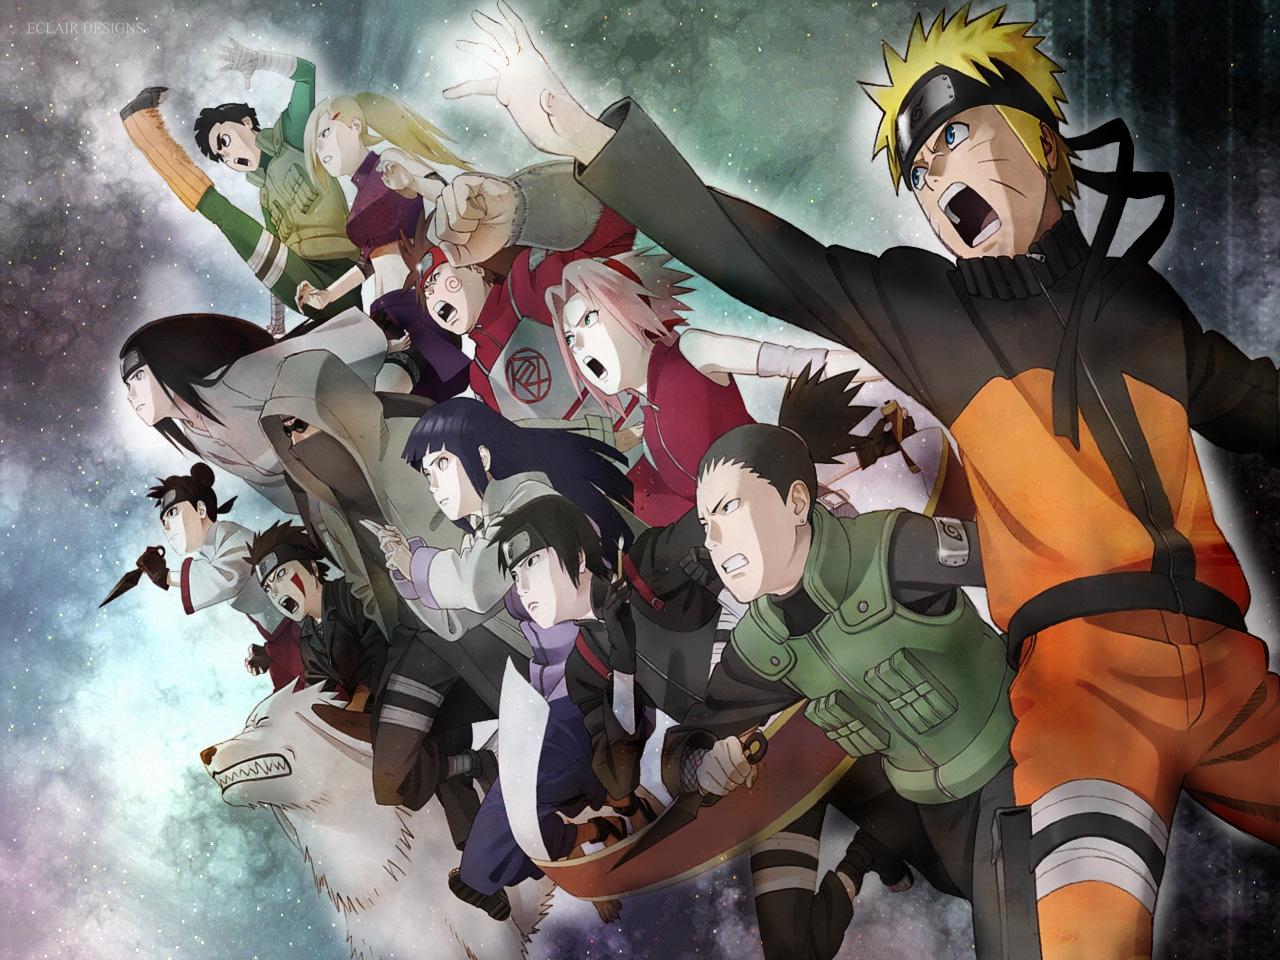 Free Download Naruto Characters Desktop Wallpaper Wallpaperpixel 1280x960 For Your Desktop Mobile Tablet Explore 78 Naruto Characters Wallpaper Hd Naruto Wallpapers Naruto Laptop Wallpapers